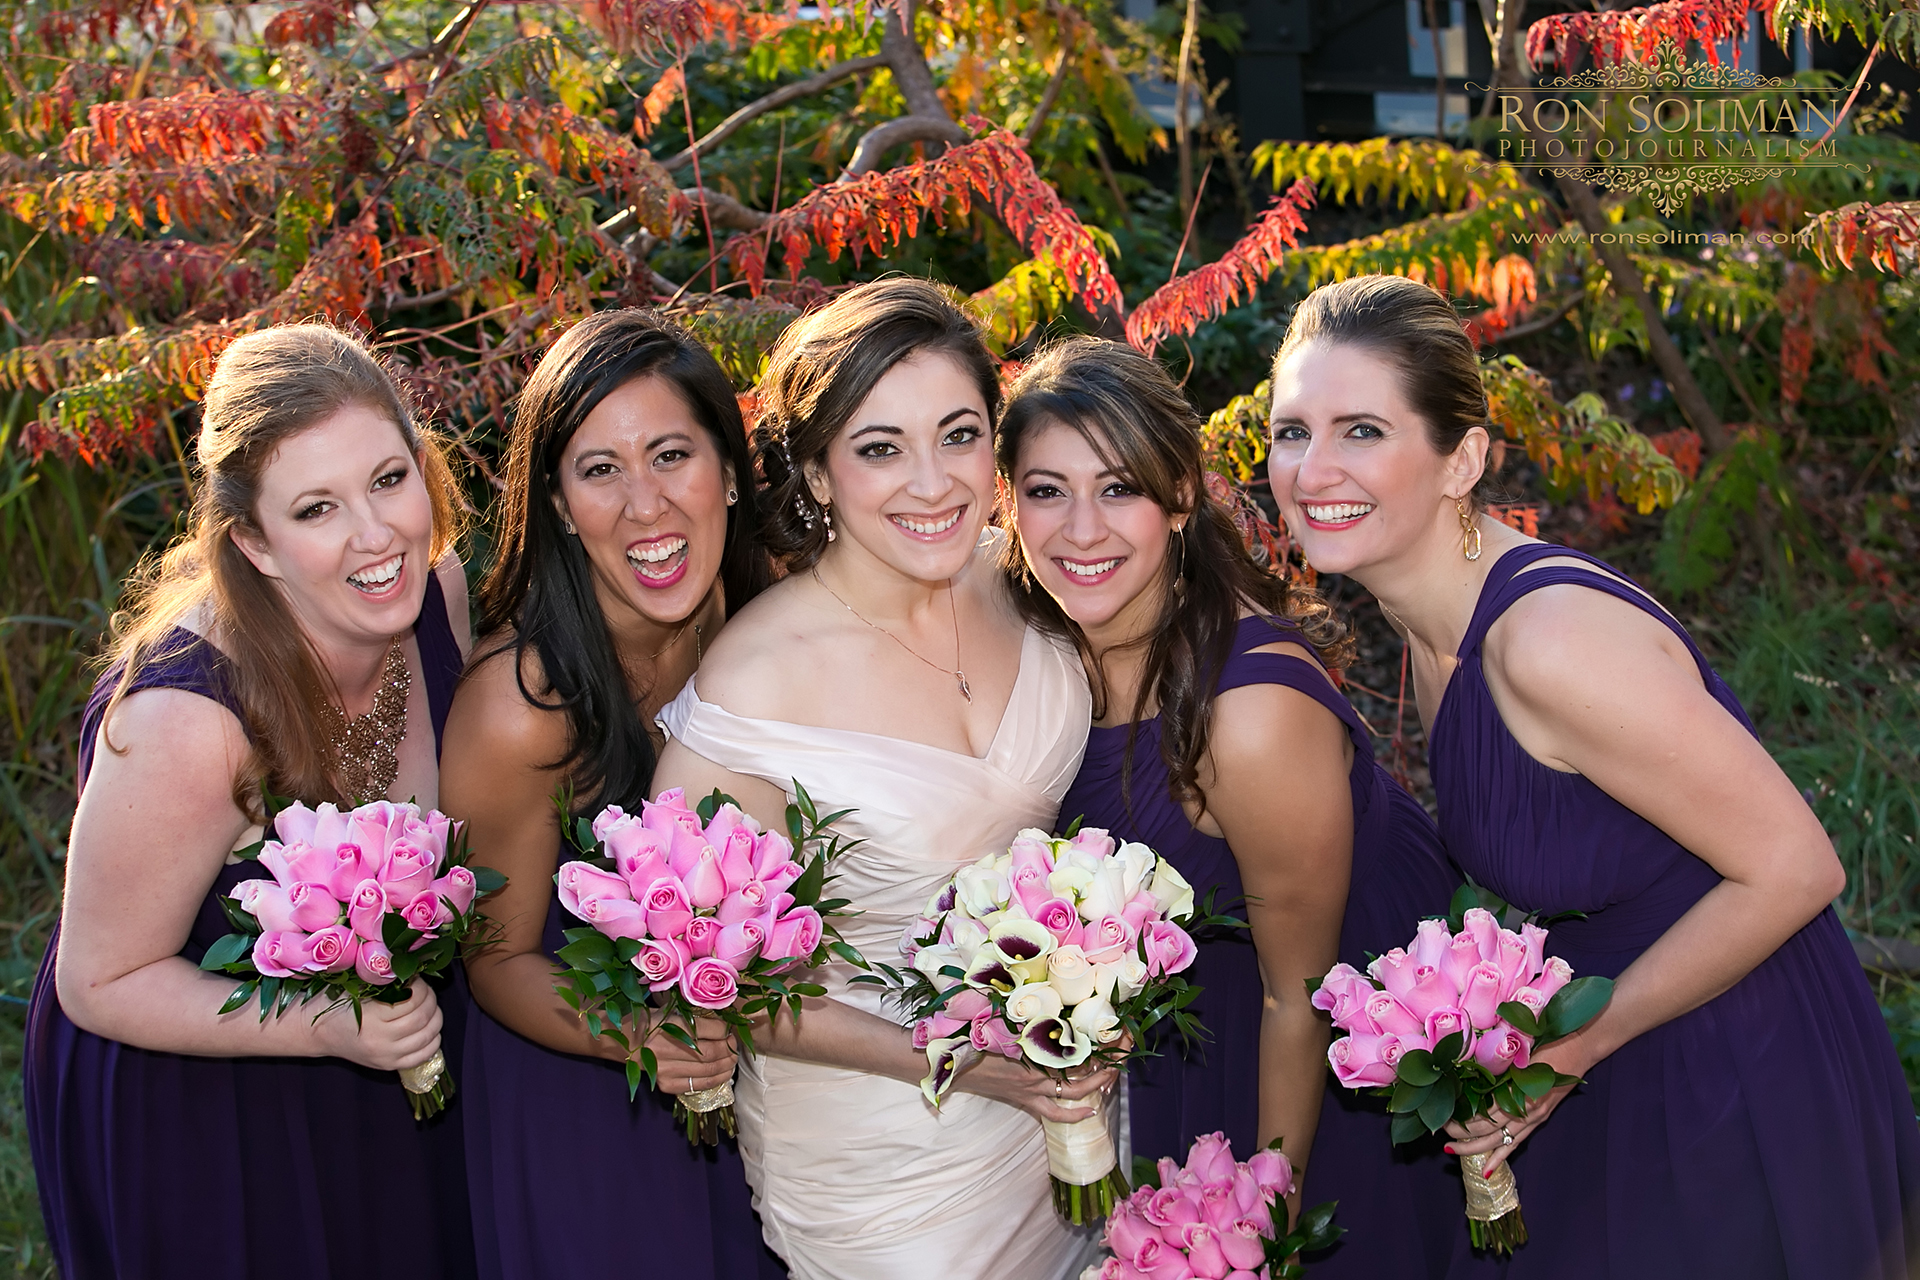 LIGHTHOUSE CHELSEA PIERS WEDDING 21